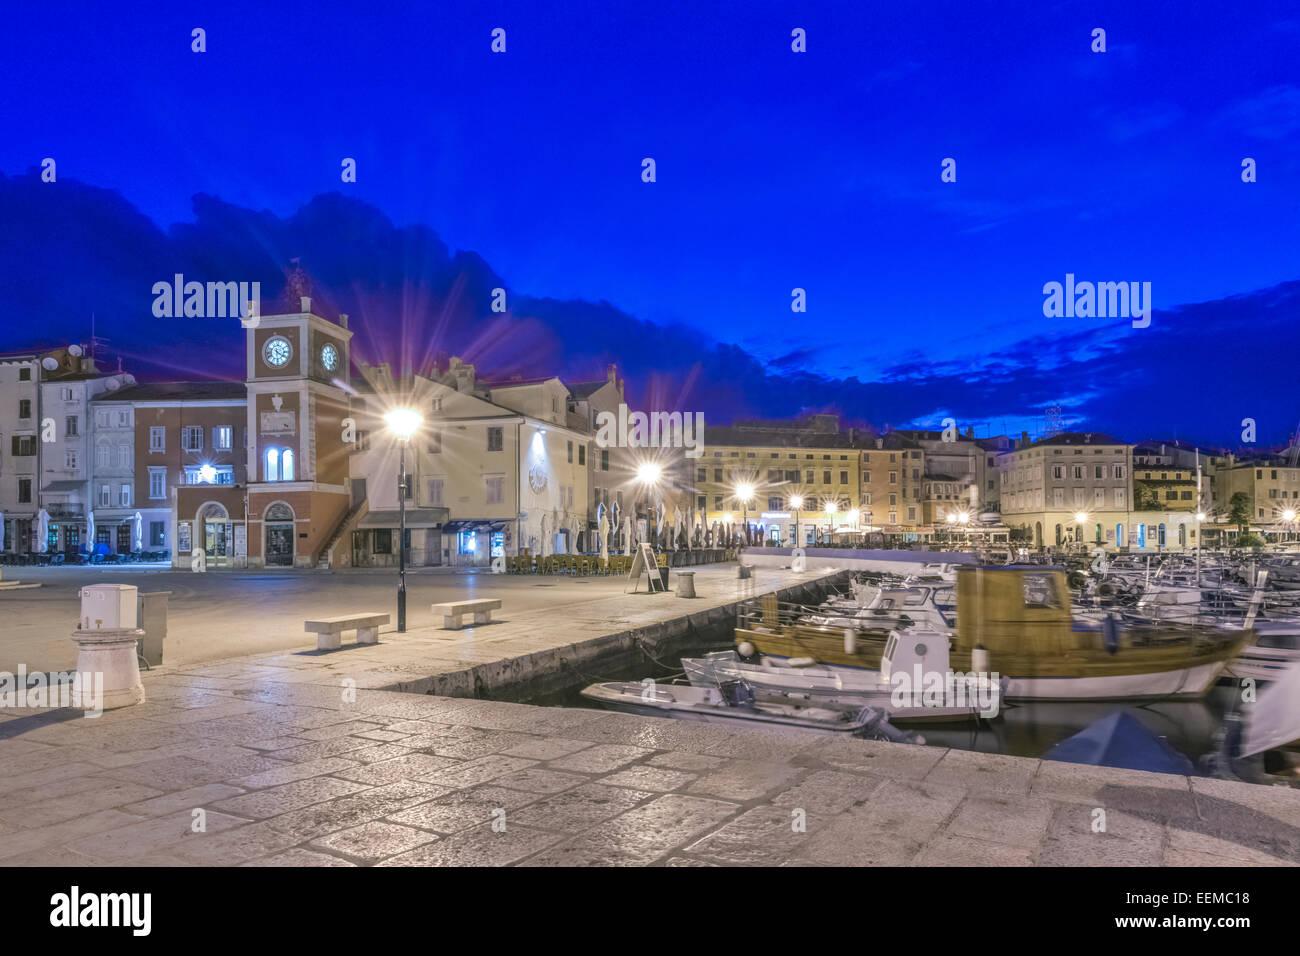 Illuminated waterfront promenade and dock at night, Rovinj, Istria, Croatia - Stock Image